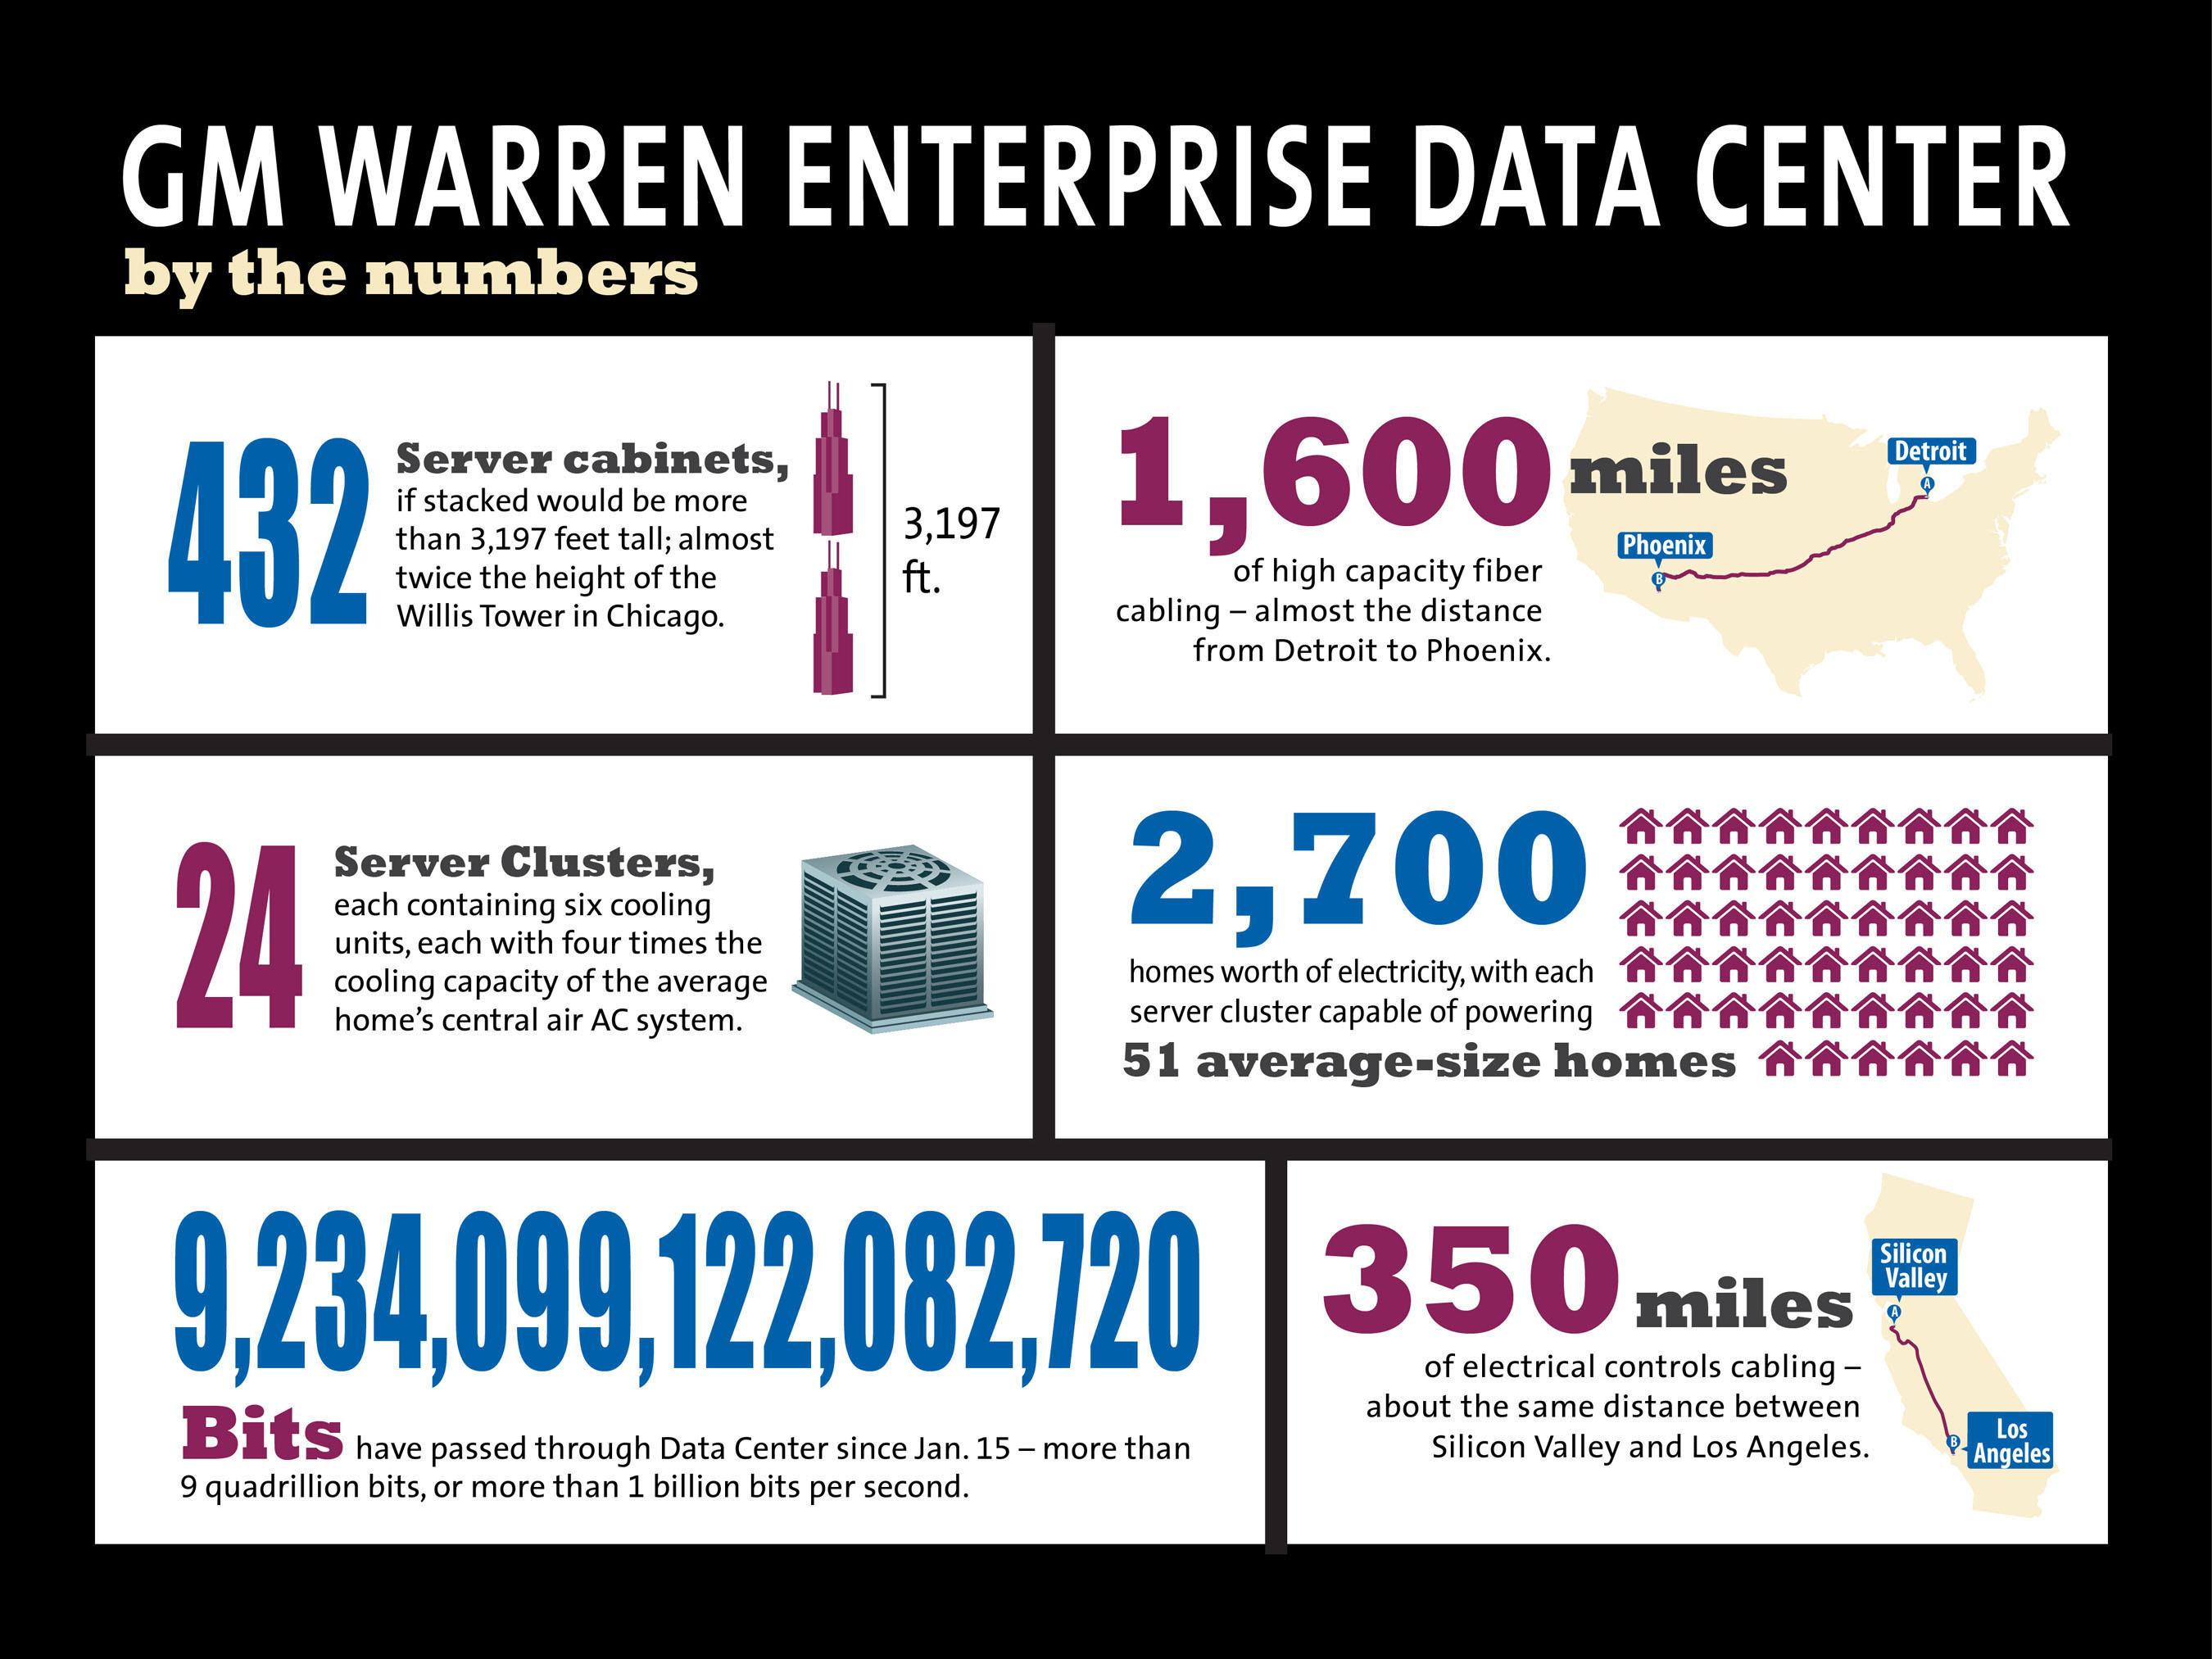 GM's New Enterprise Data Center Transforms Global IT